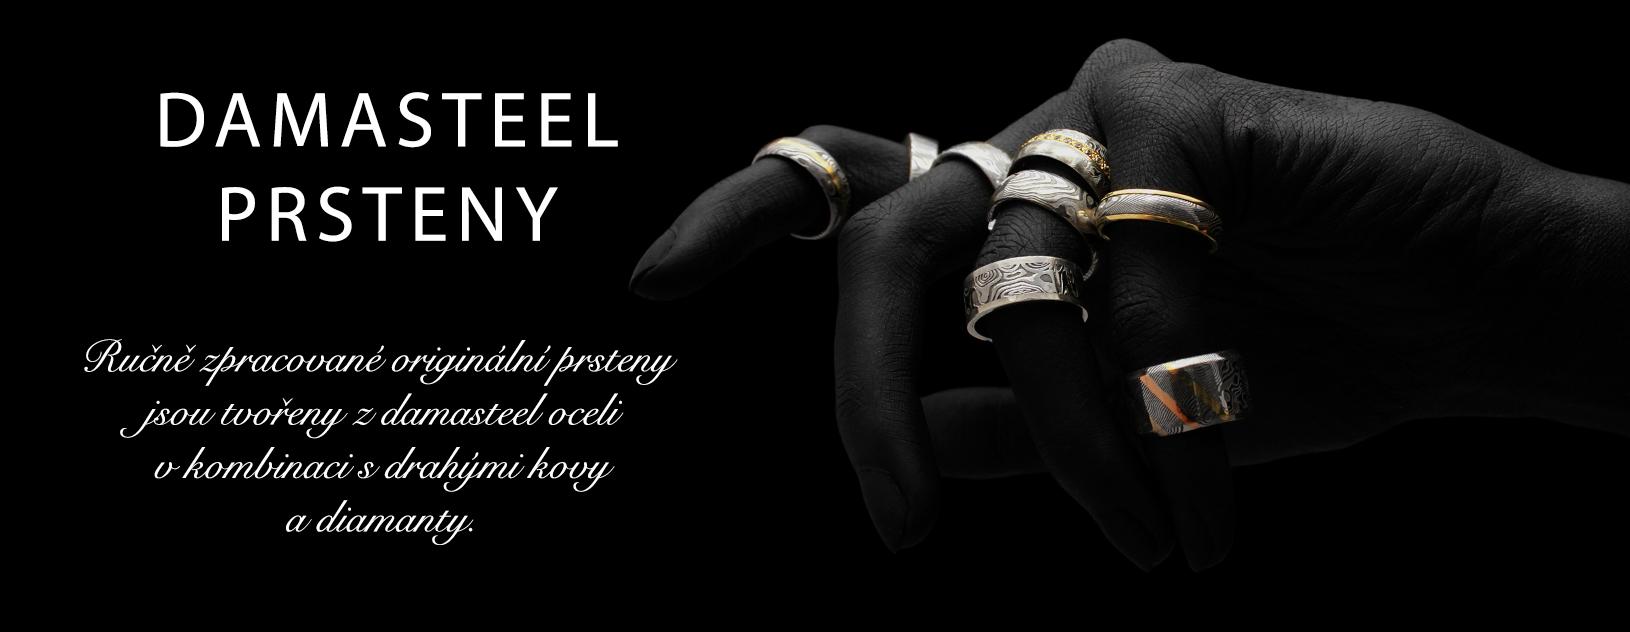 damasteel kované prsteny